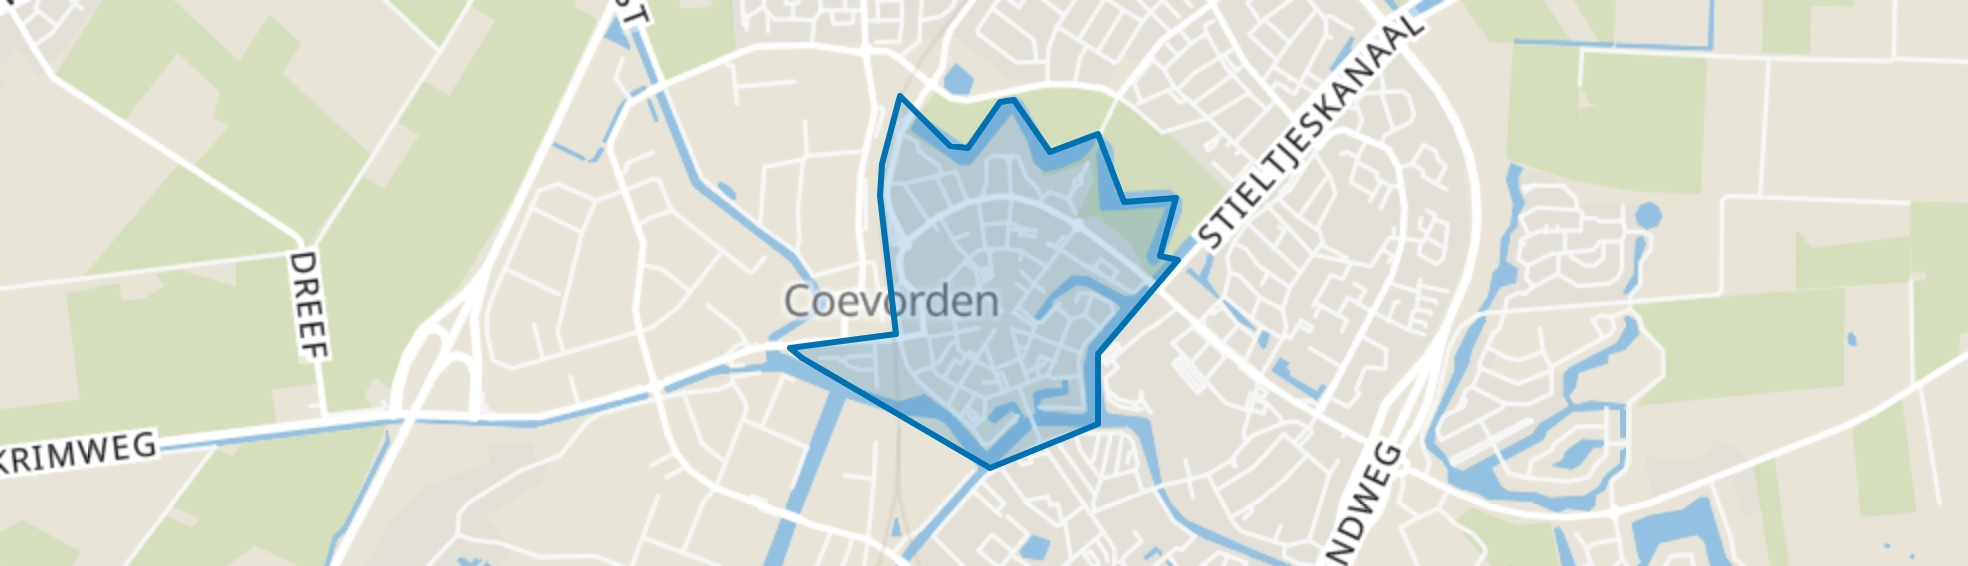 Coevorden-Centrum, Coevorden map